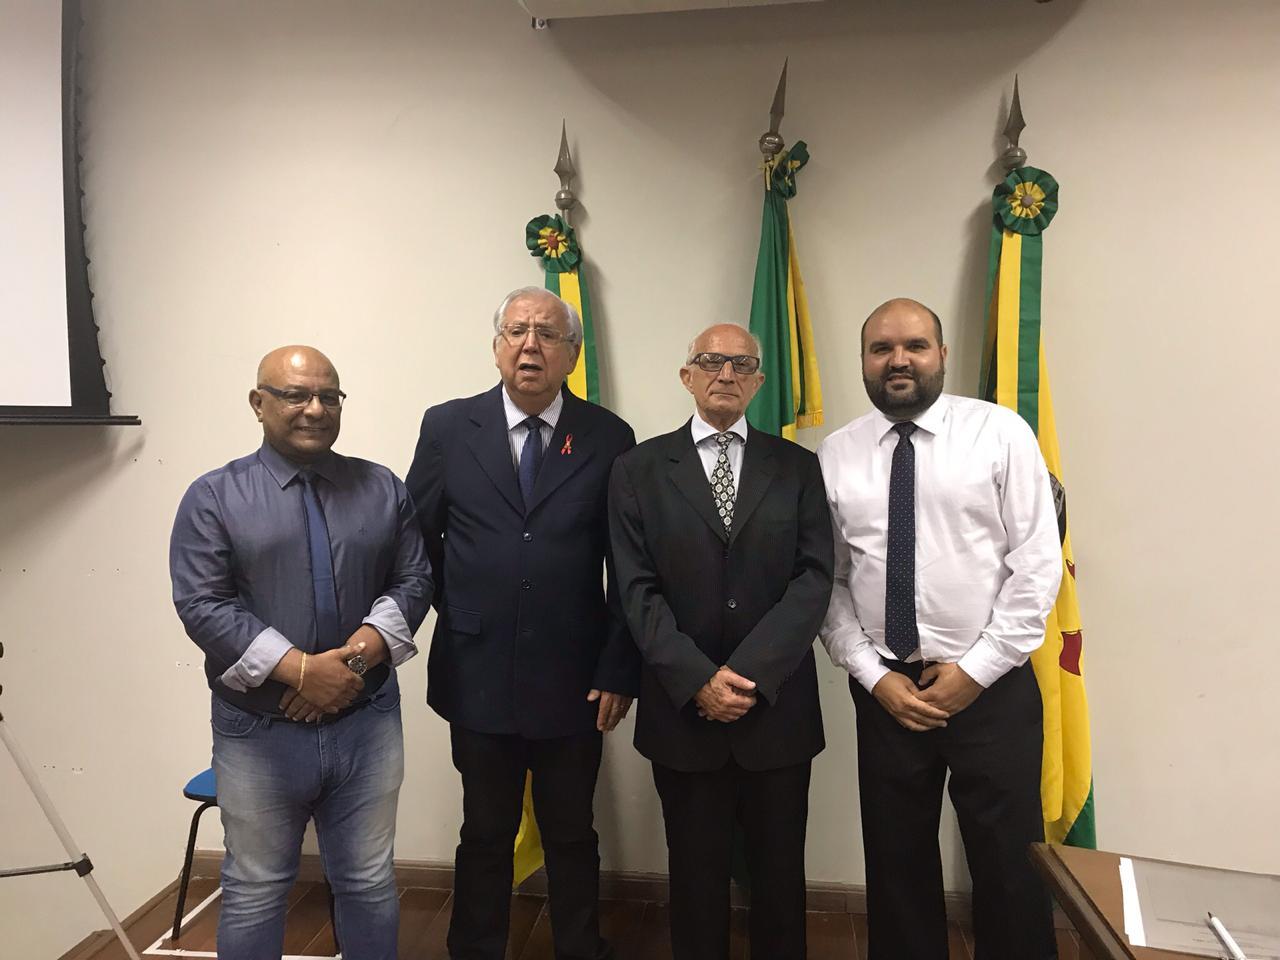 Legislativo de Guaíba elege vereador Arilene Pereira para presidente